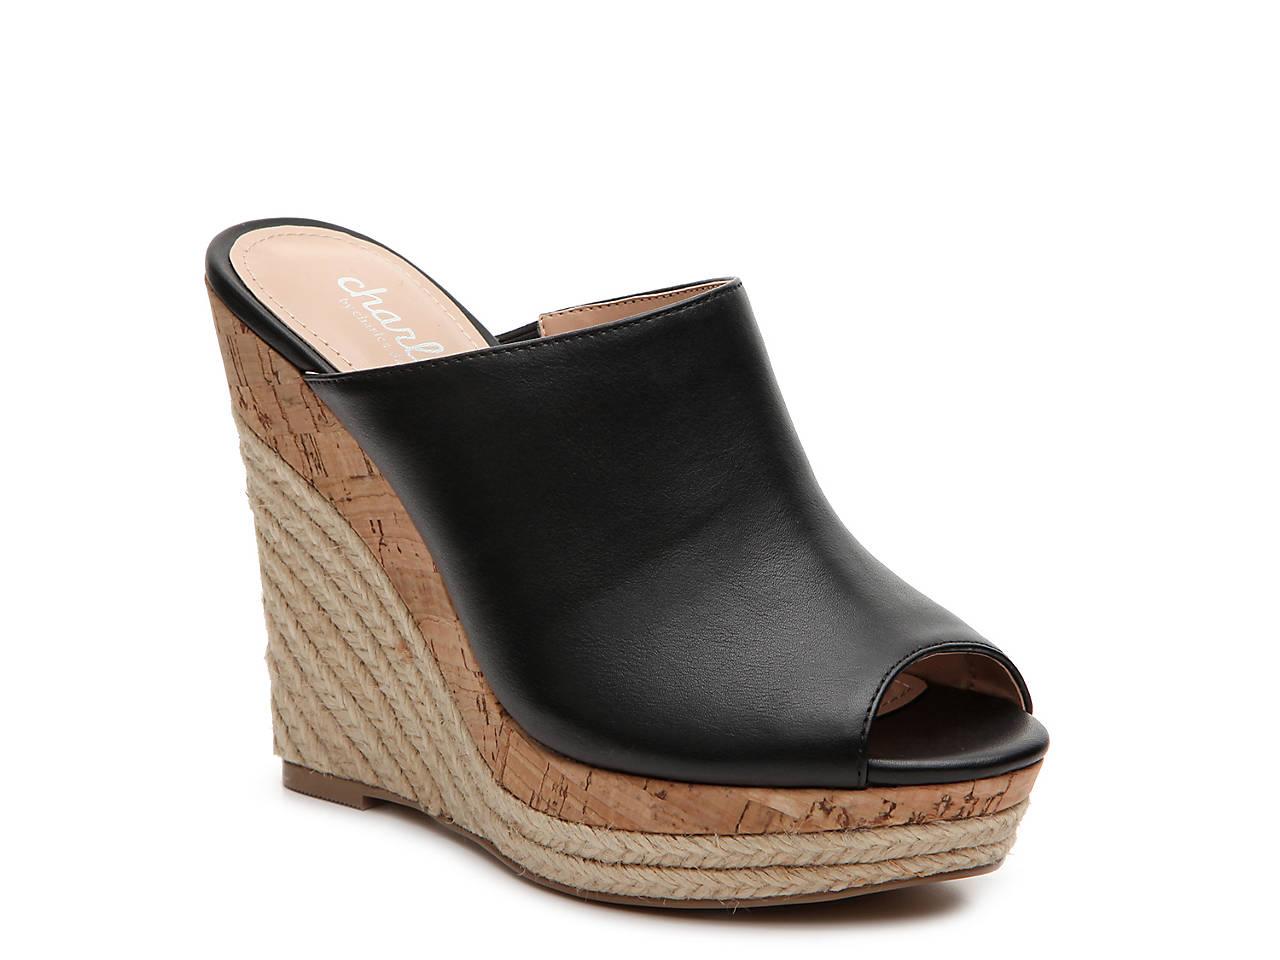 306dda6dbc6f Charles by Charles David Azie Wedge Sandal Women s Shoes